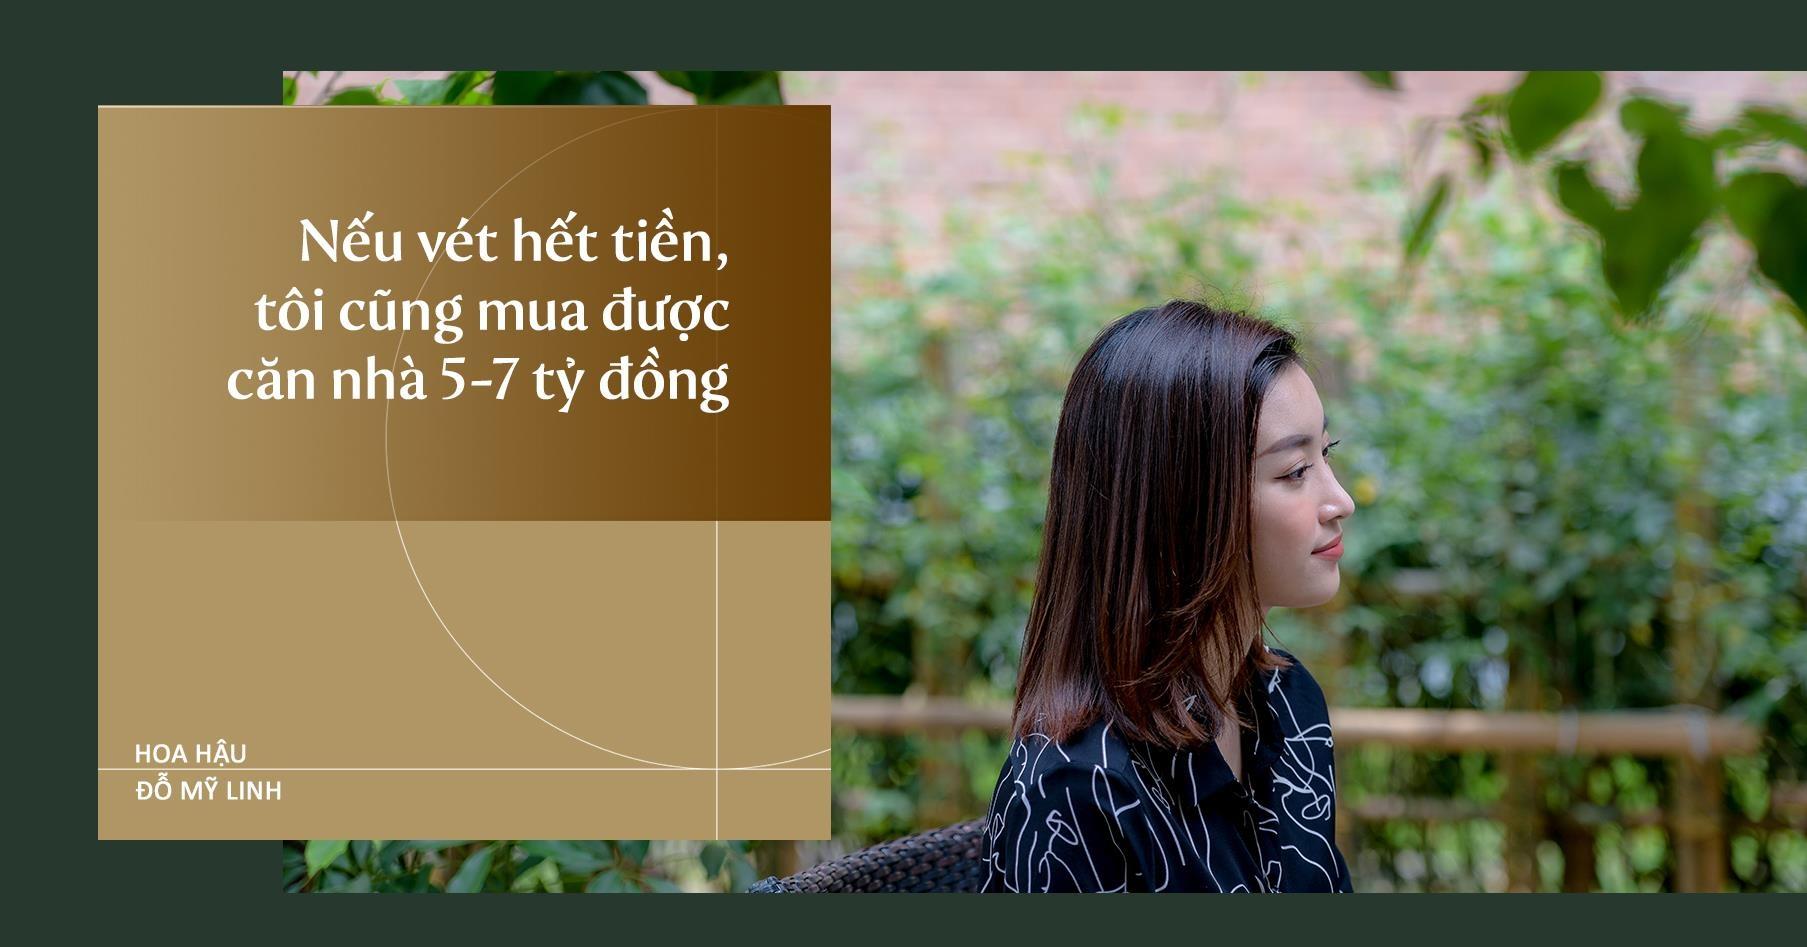 Hoa hau Do My Linh: 'Neu vet het tien toi cung mua duoc nha 7 ty dong' hinh anh 12